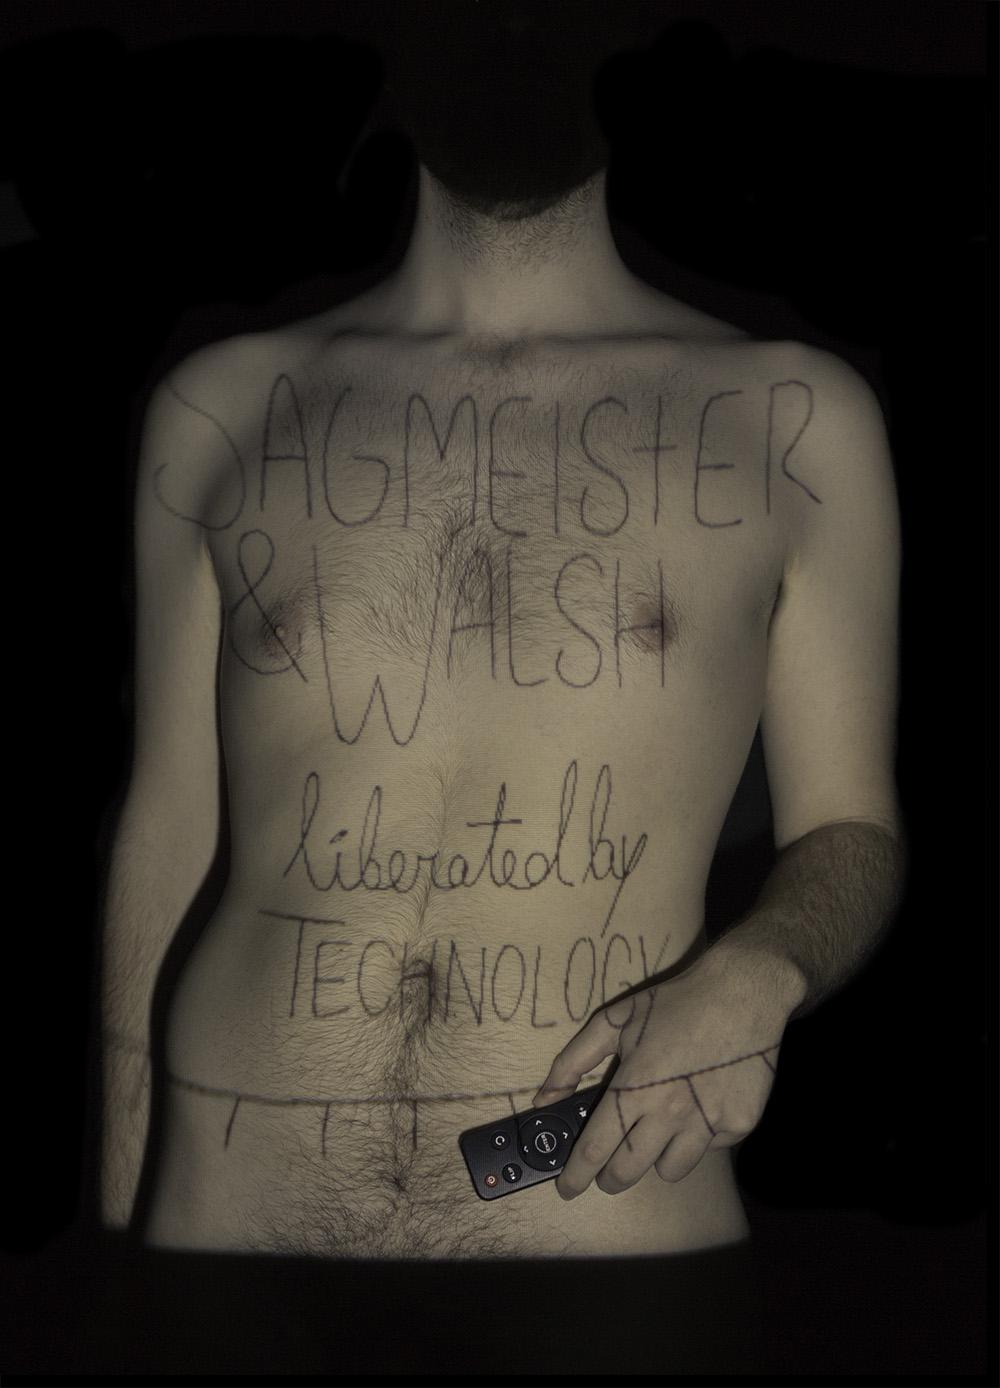 Sagmeister.jpg